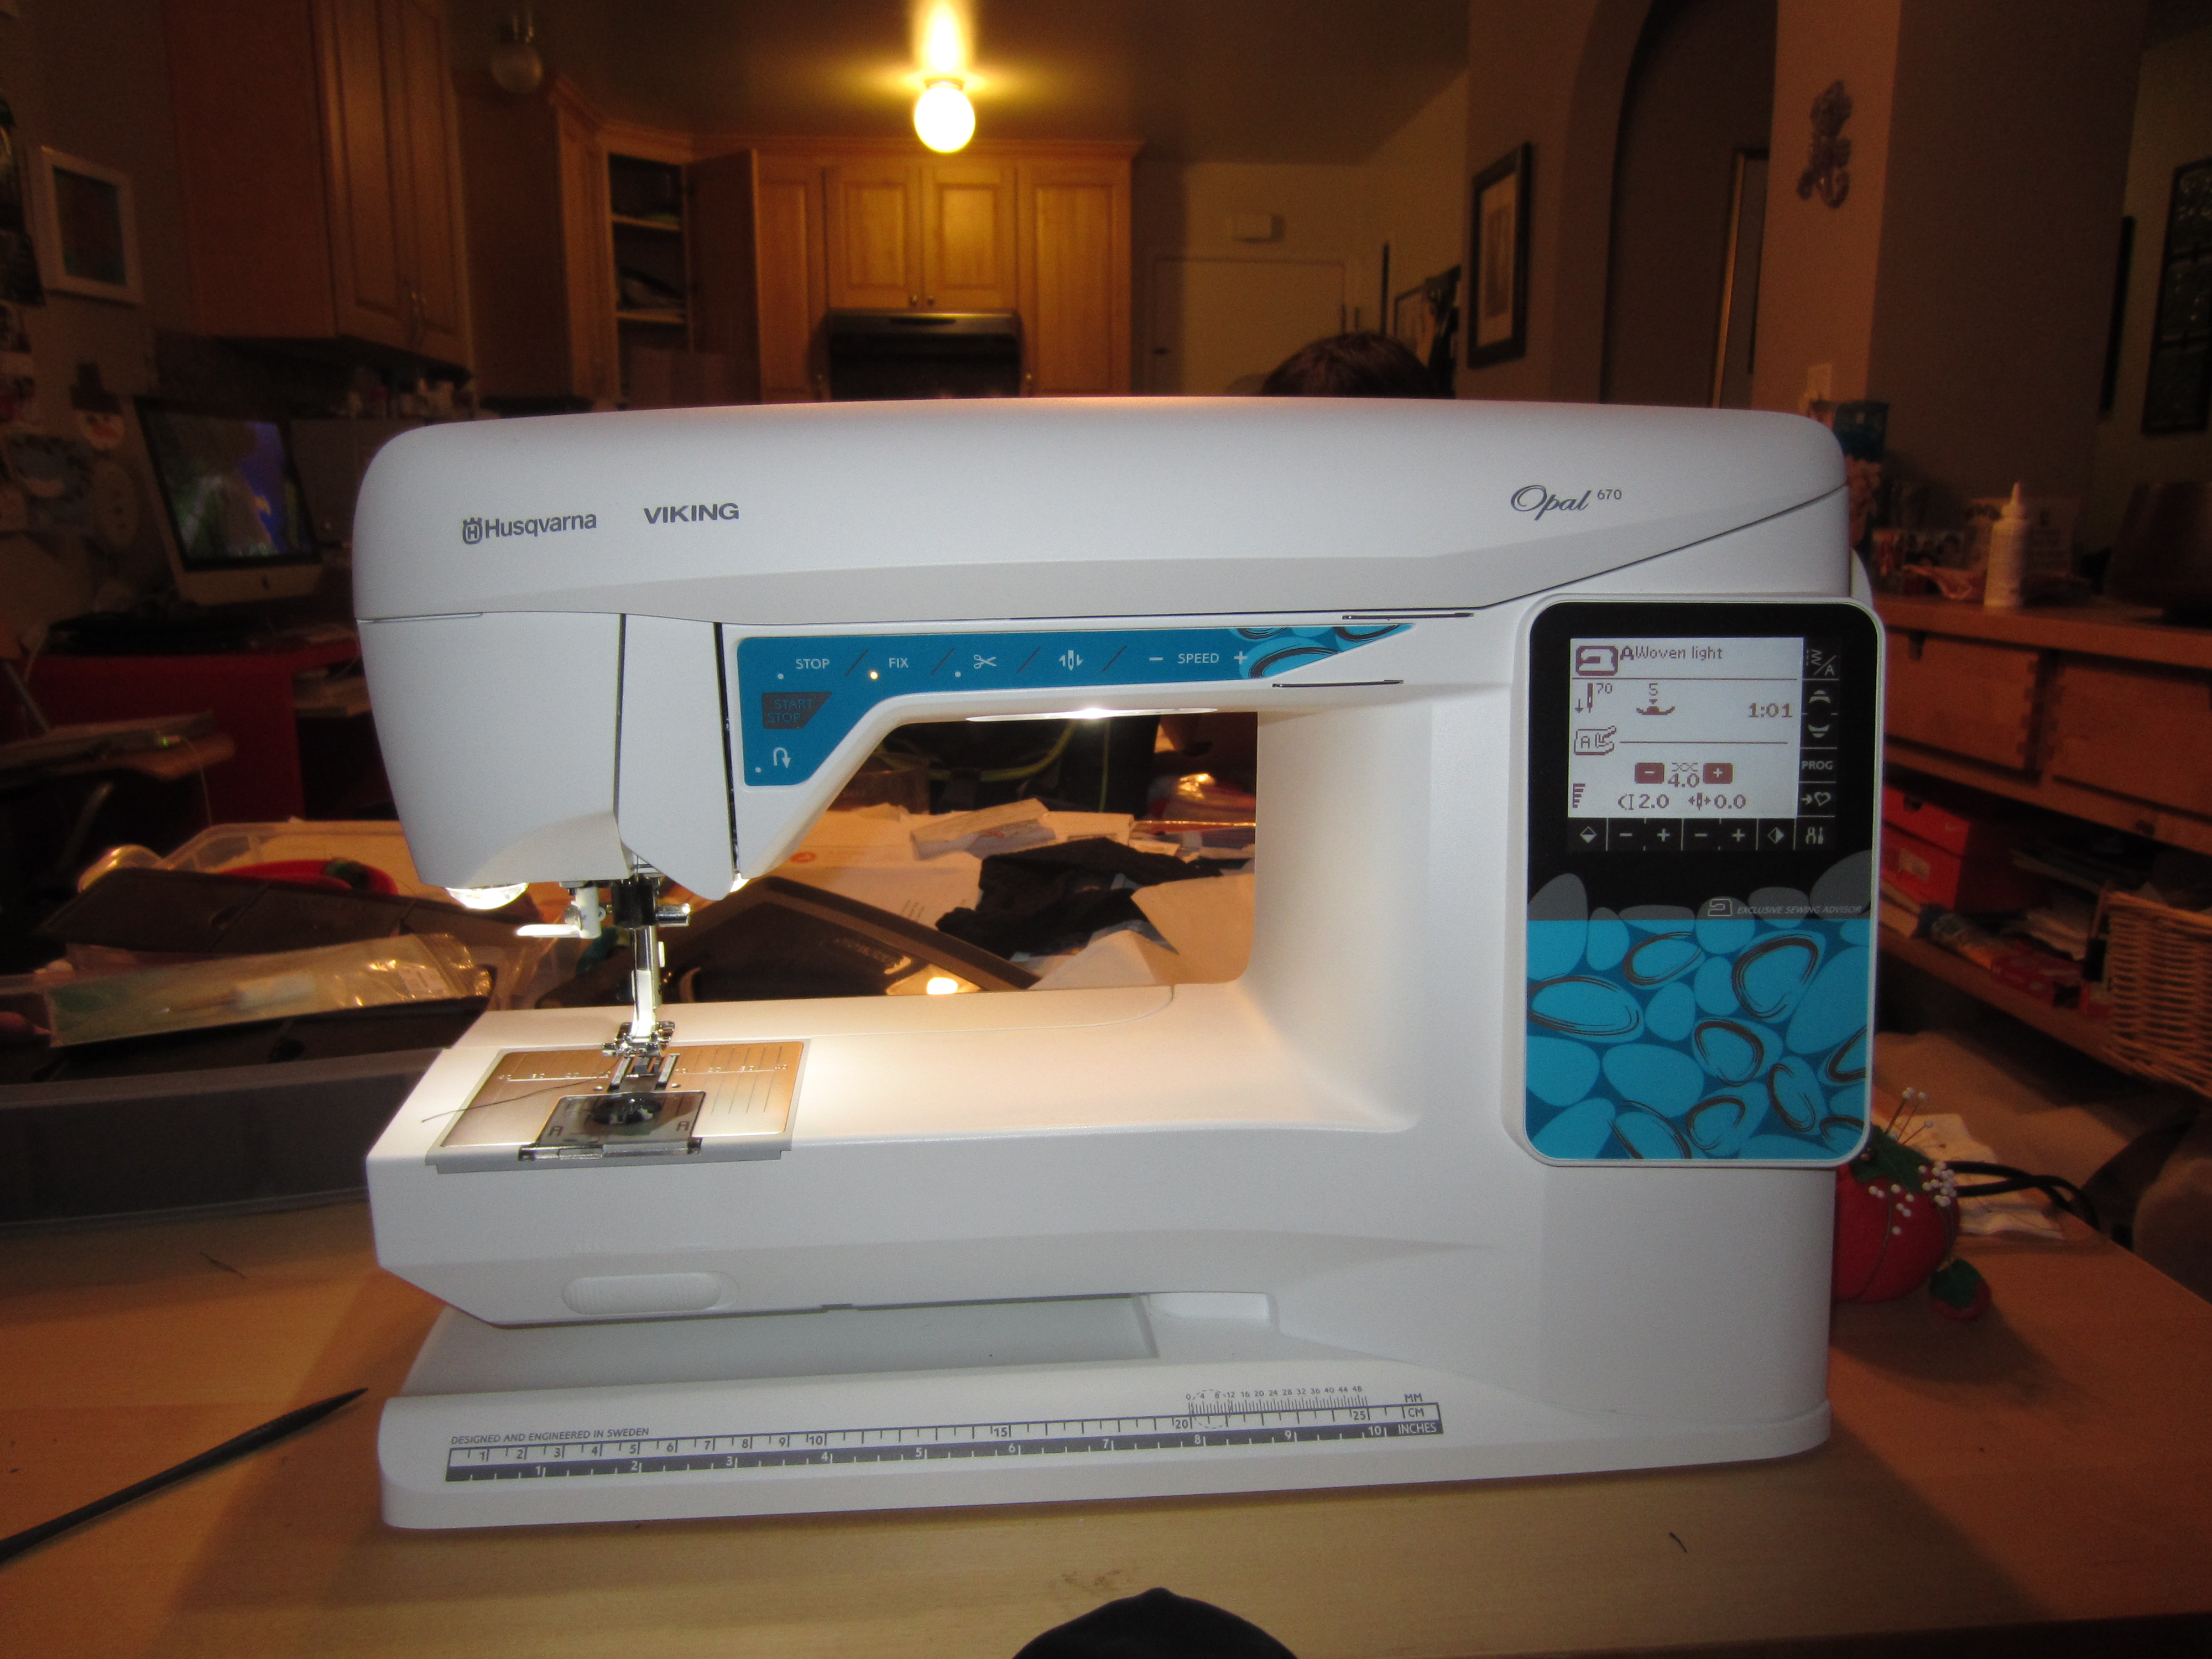 IMG_1406. It's my lovely machine. My Husqvarna Viking Opal 670.